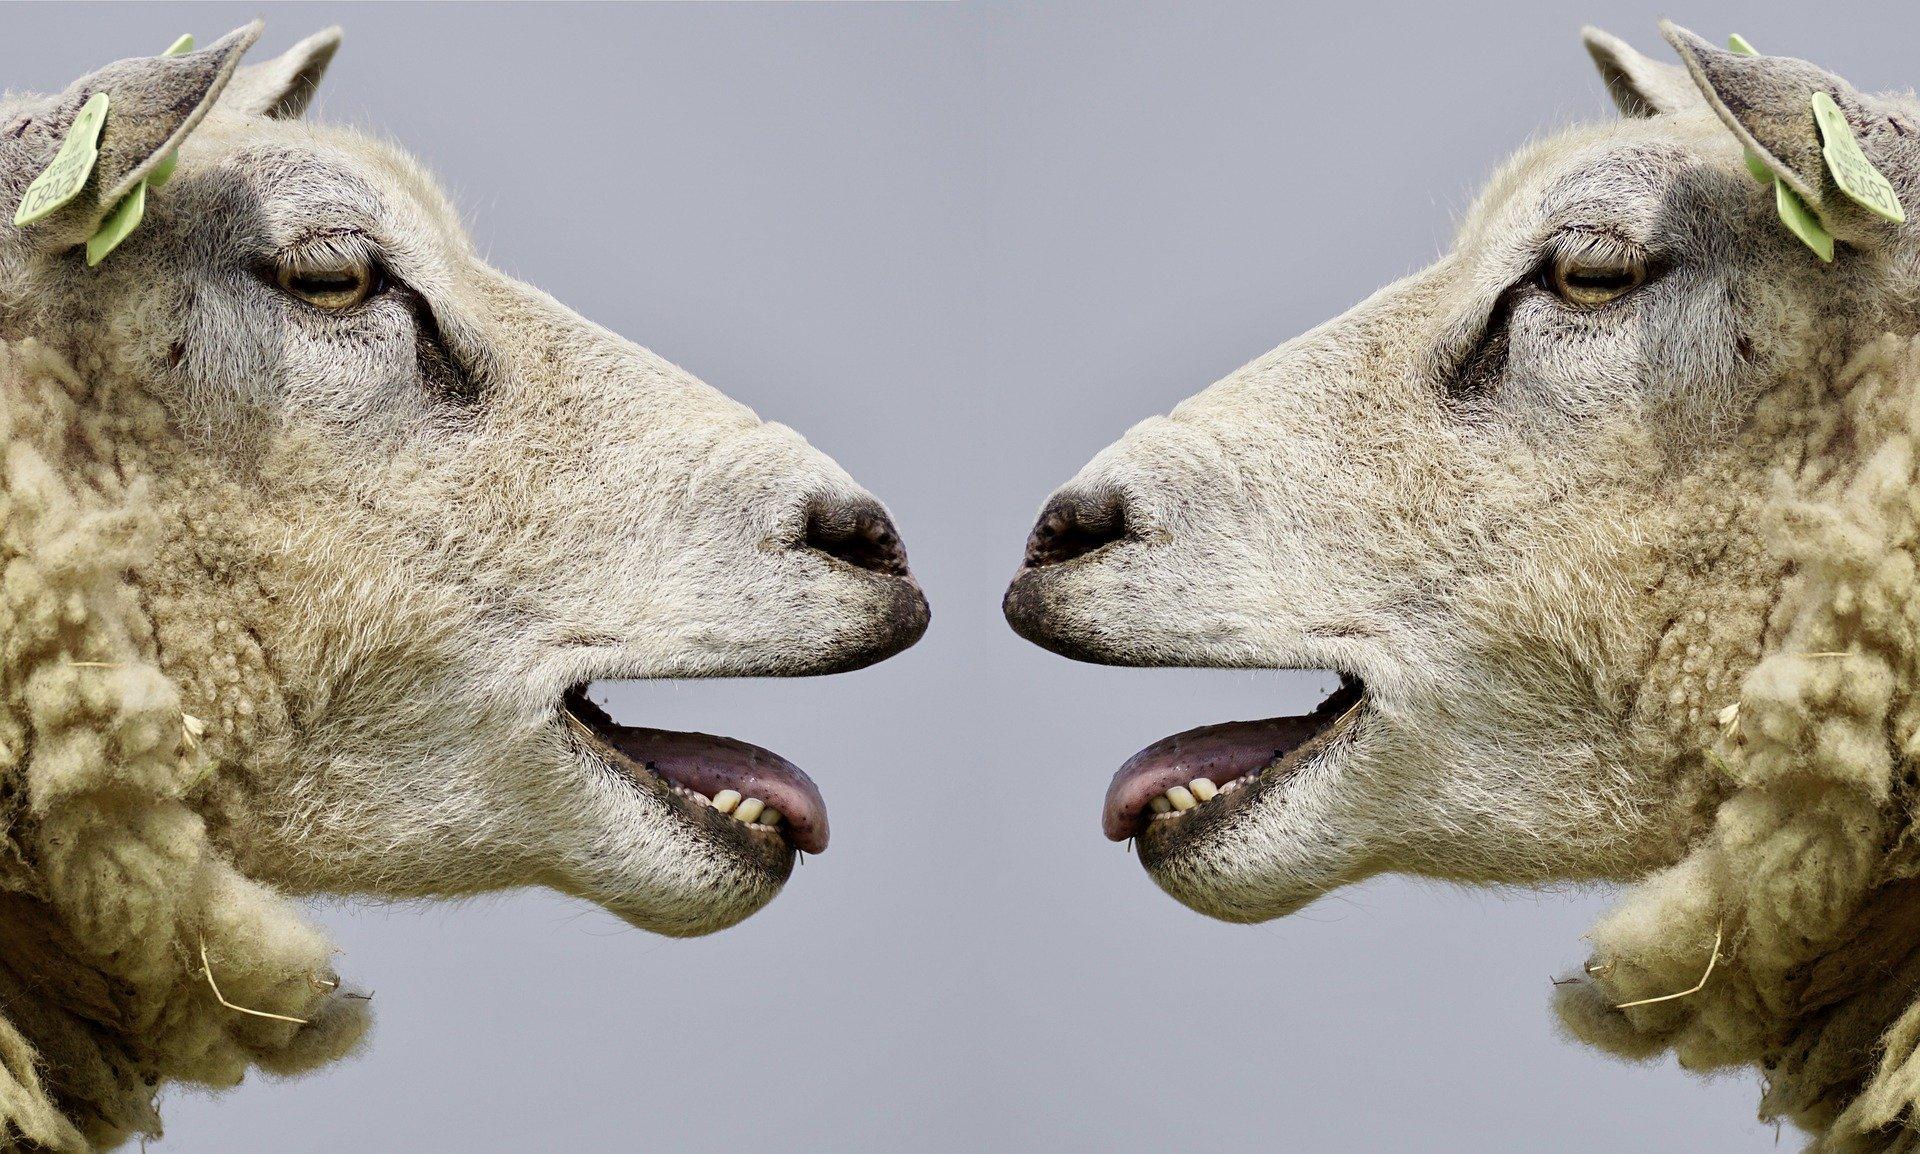 sheep 2372148 1920